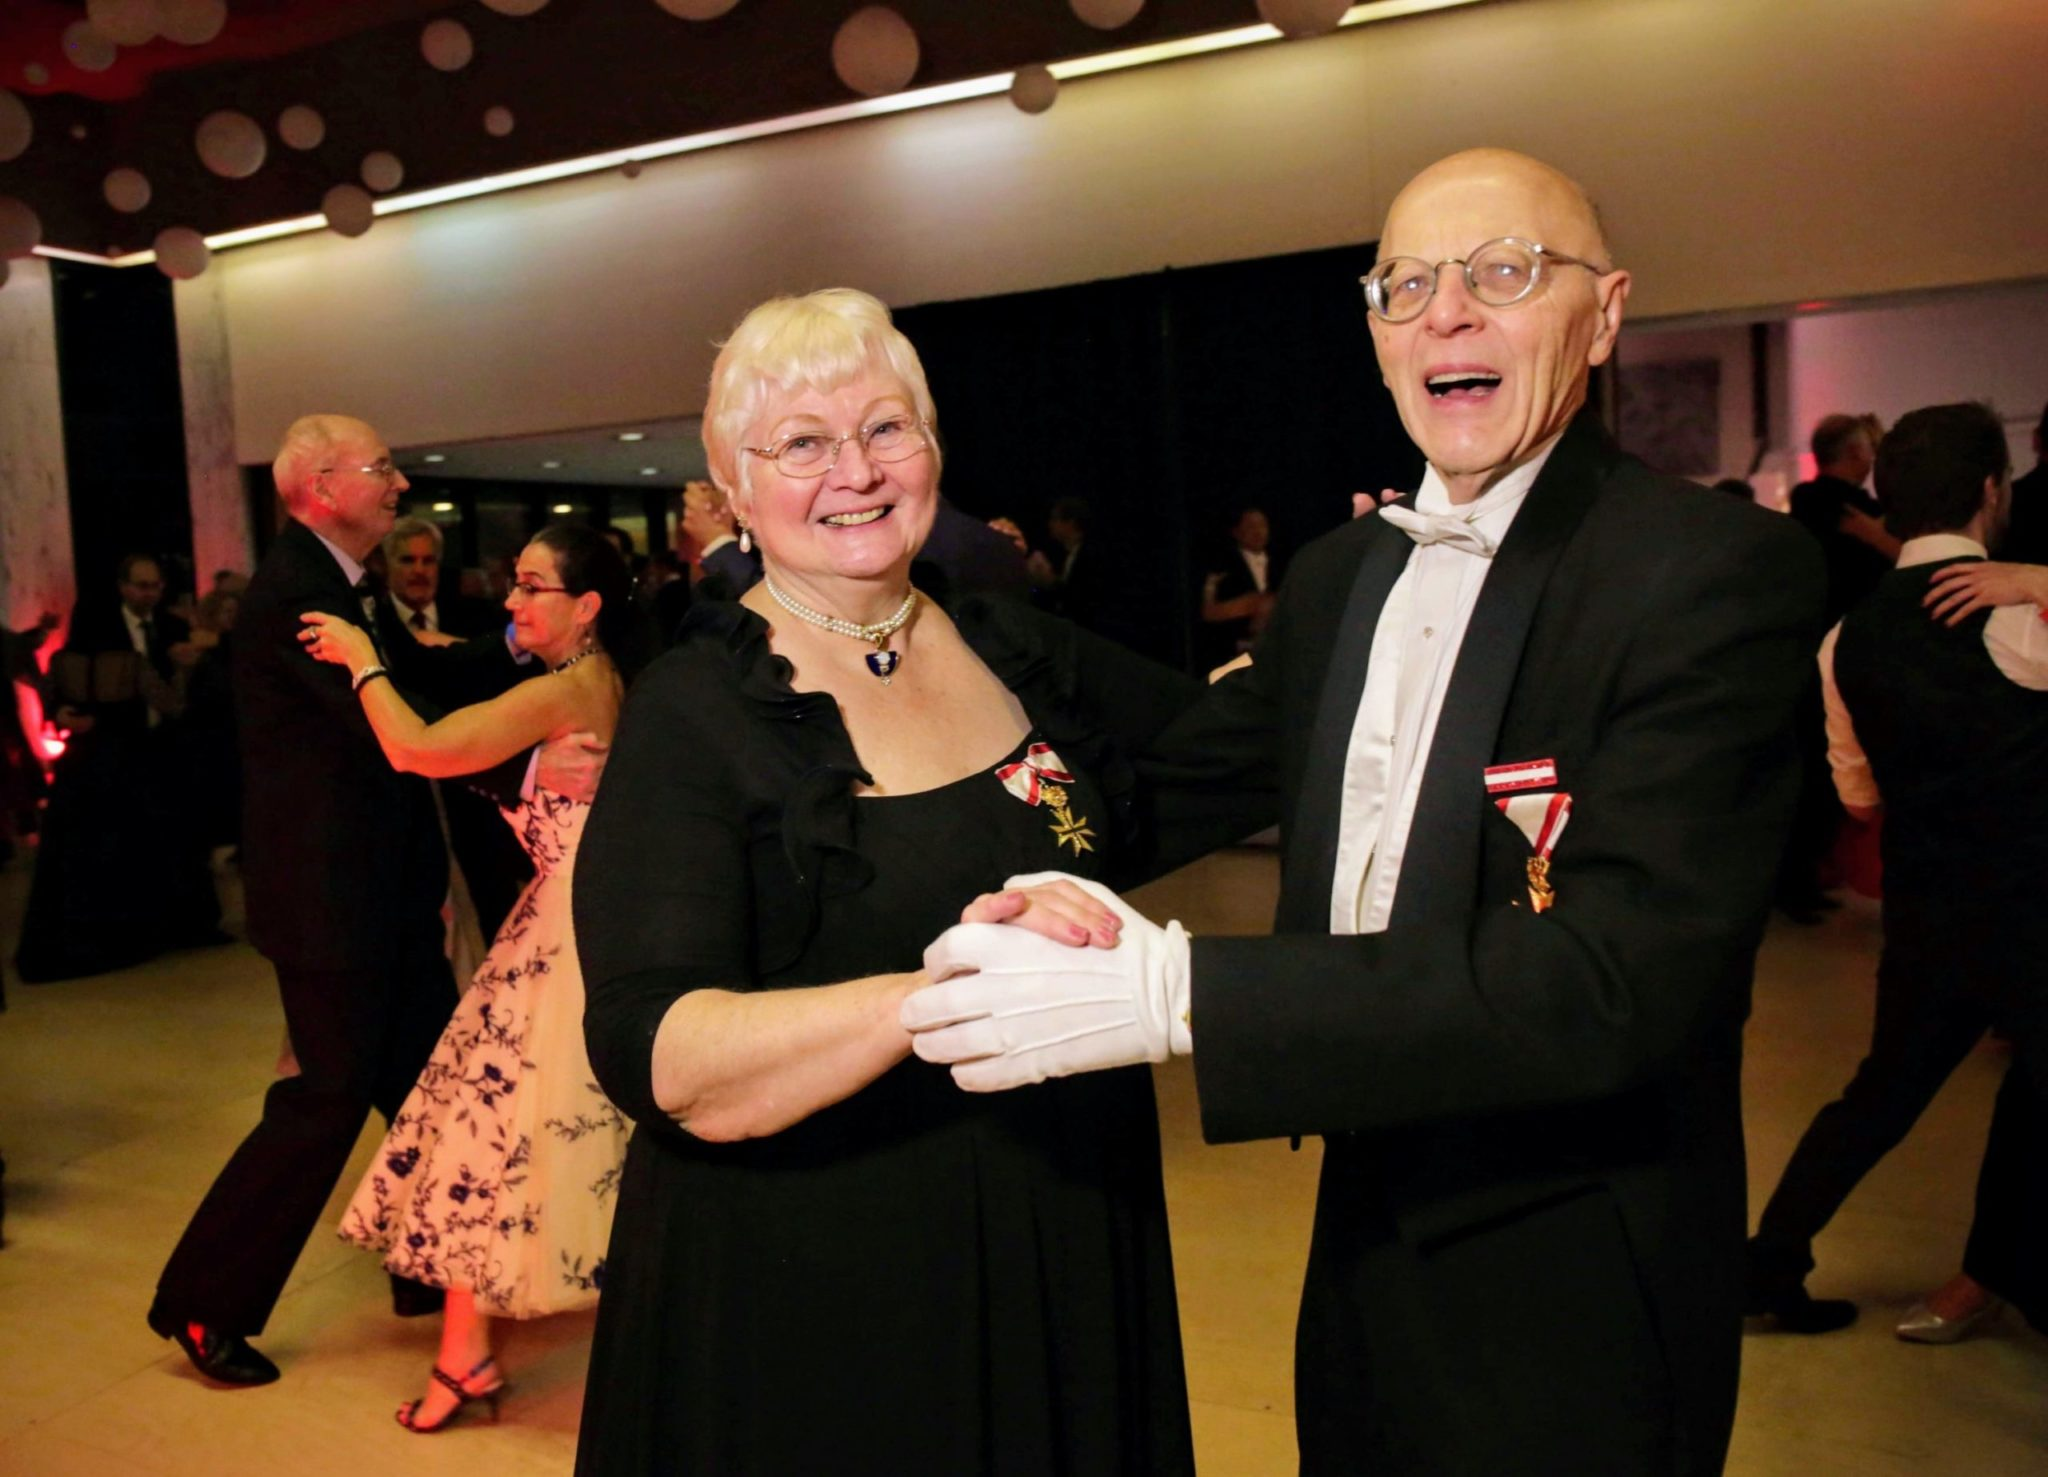 Meet the Septuagenarian Couple That Teaches DC How to Waltz